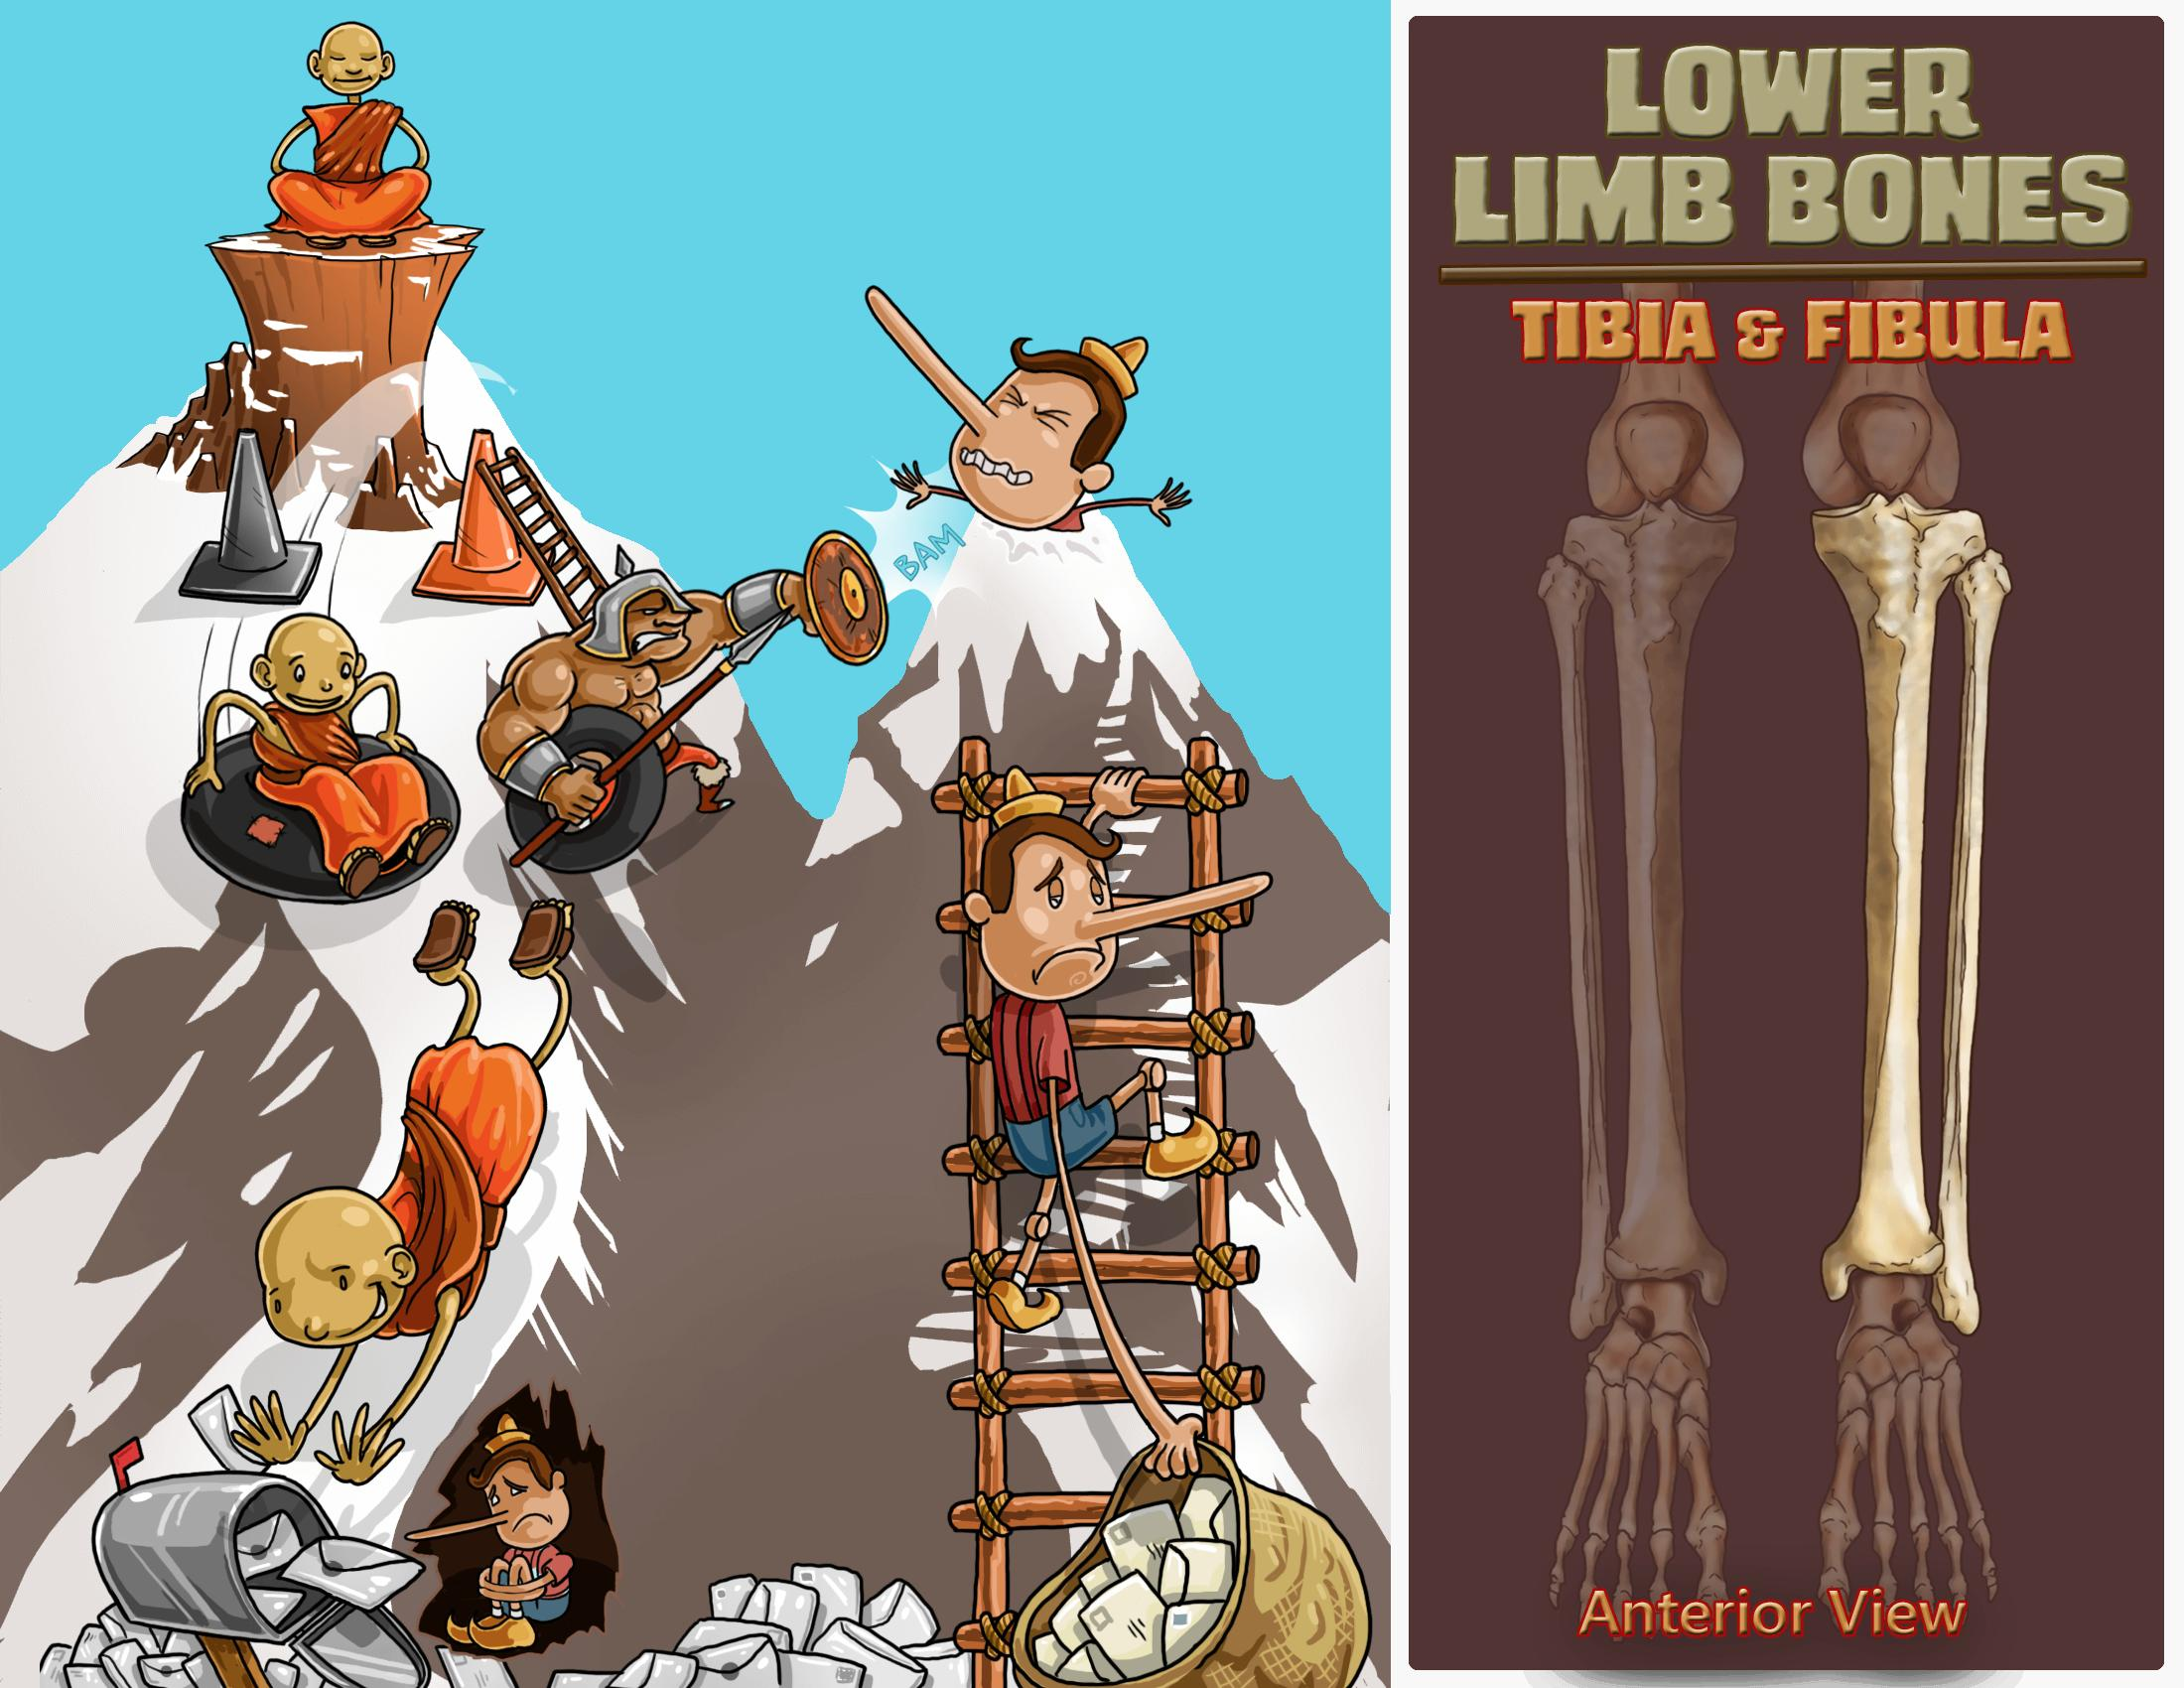 Lower Limb Bones - Tibia and Fibula